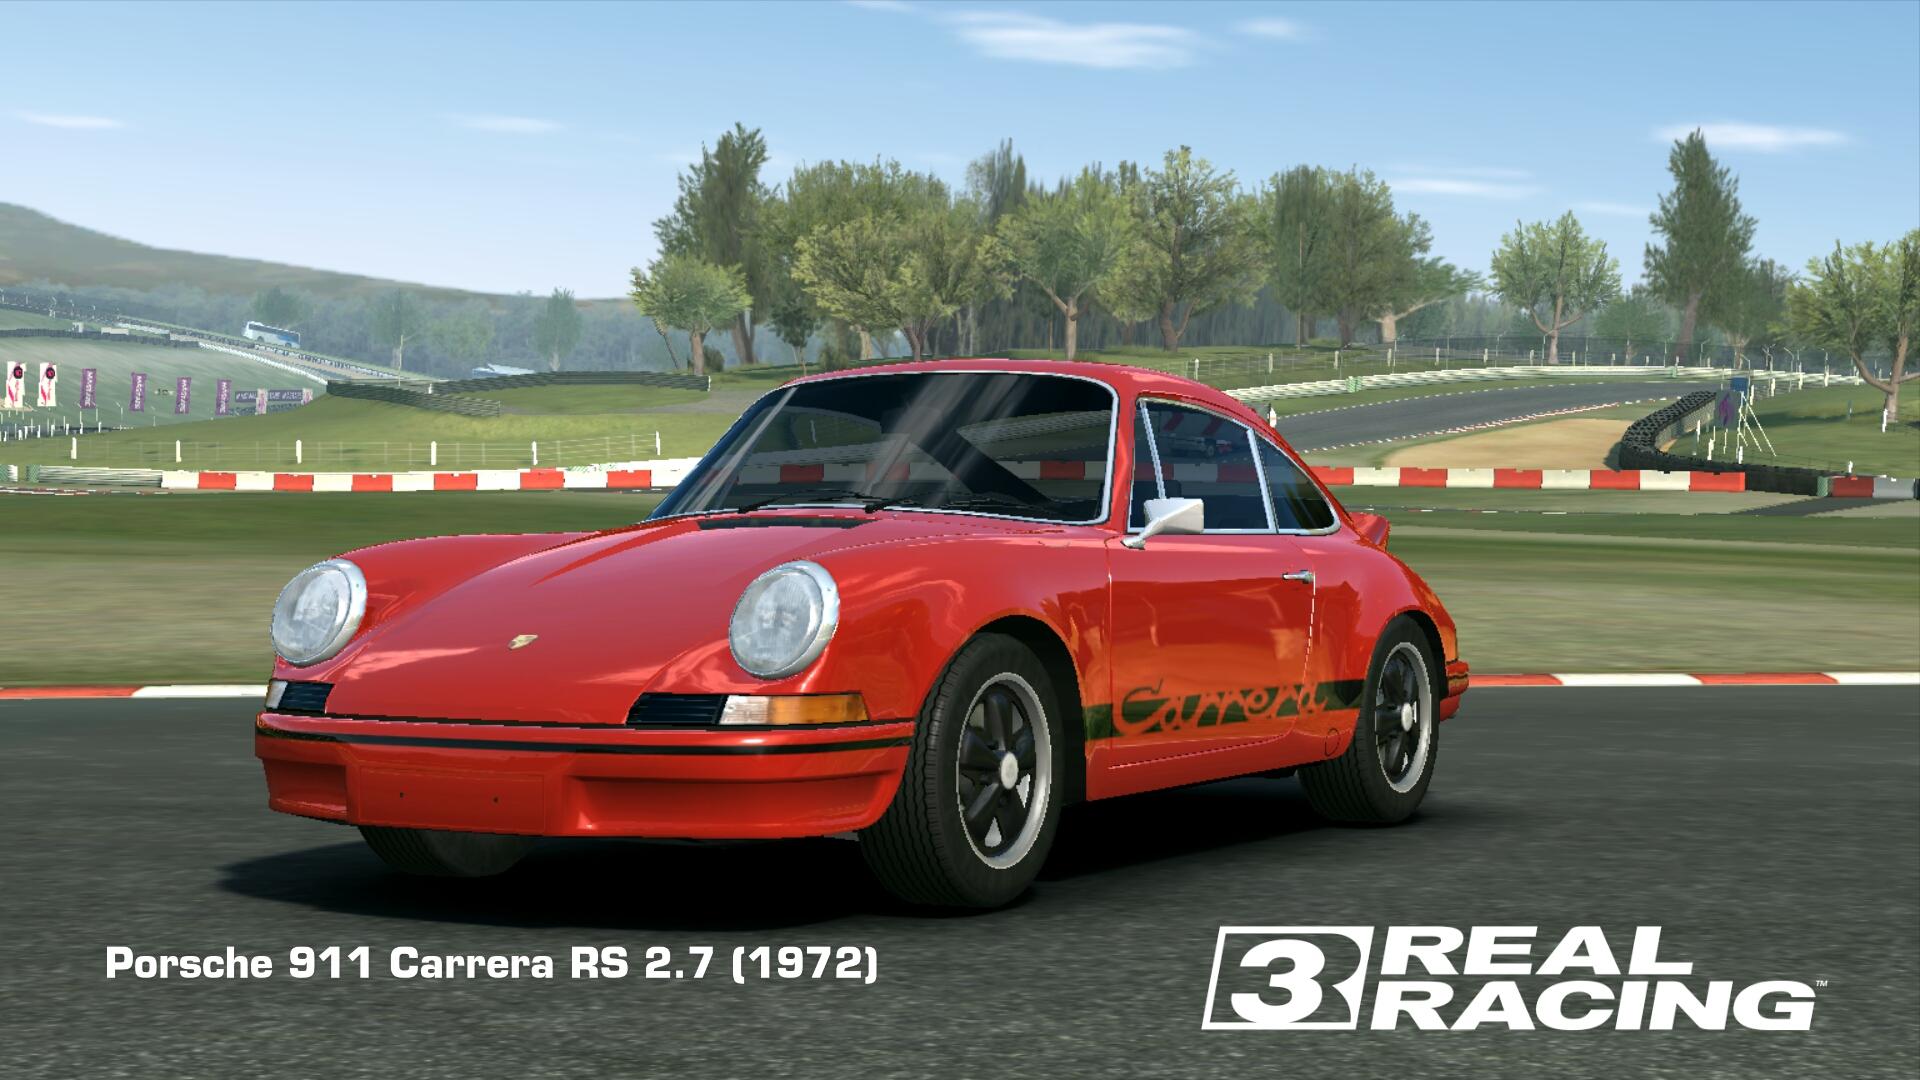 Showcase Porsche 911 Carrera RS 2.7 (1972)